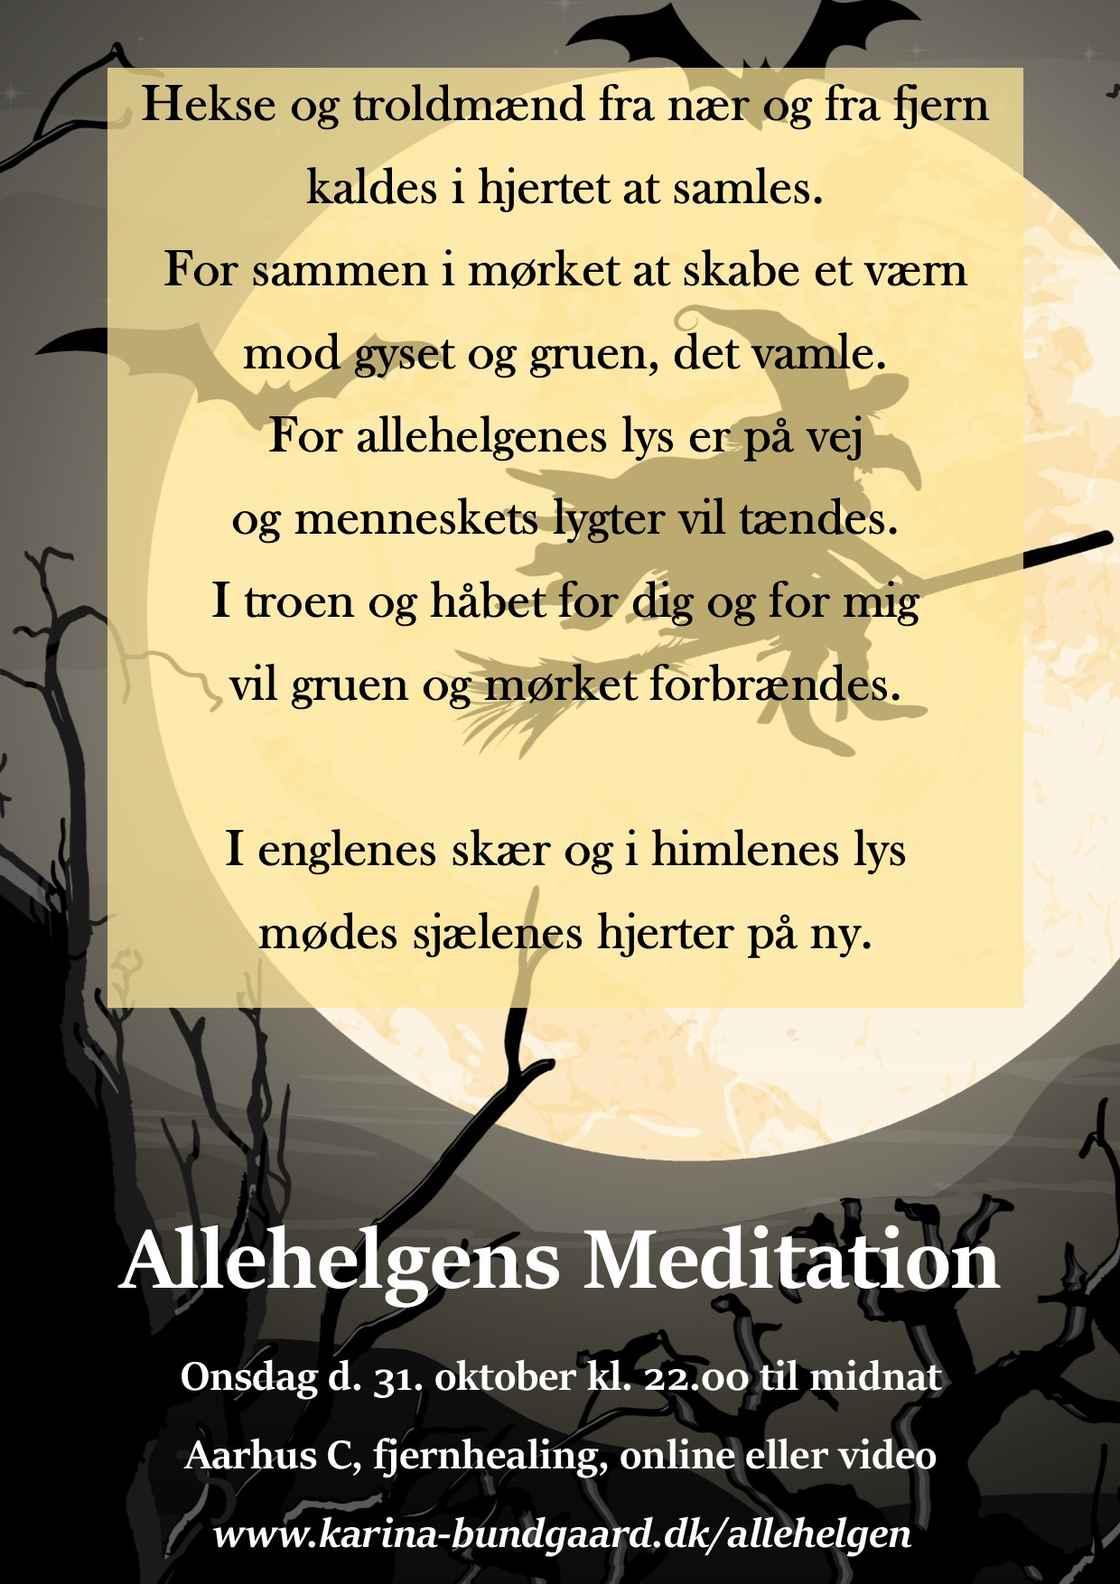 1001-allehelgen-poem-2018-karina-bundgaard-jpg.jpg